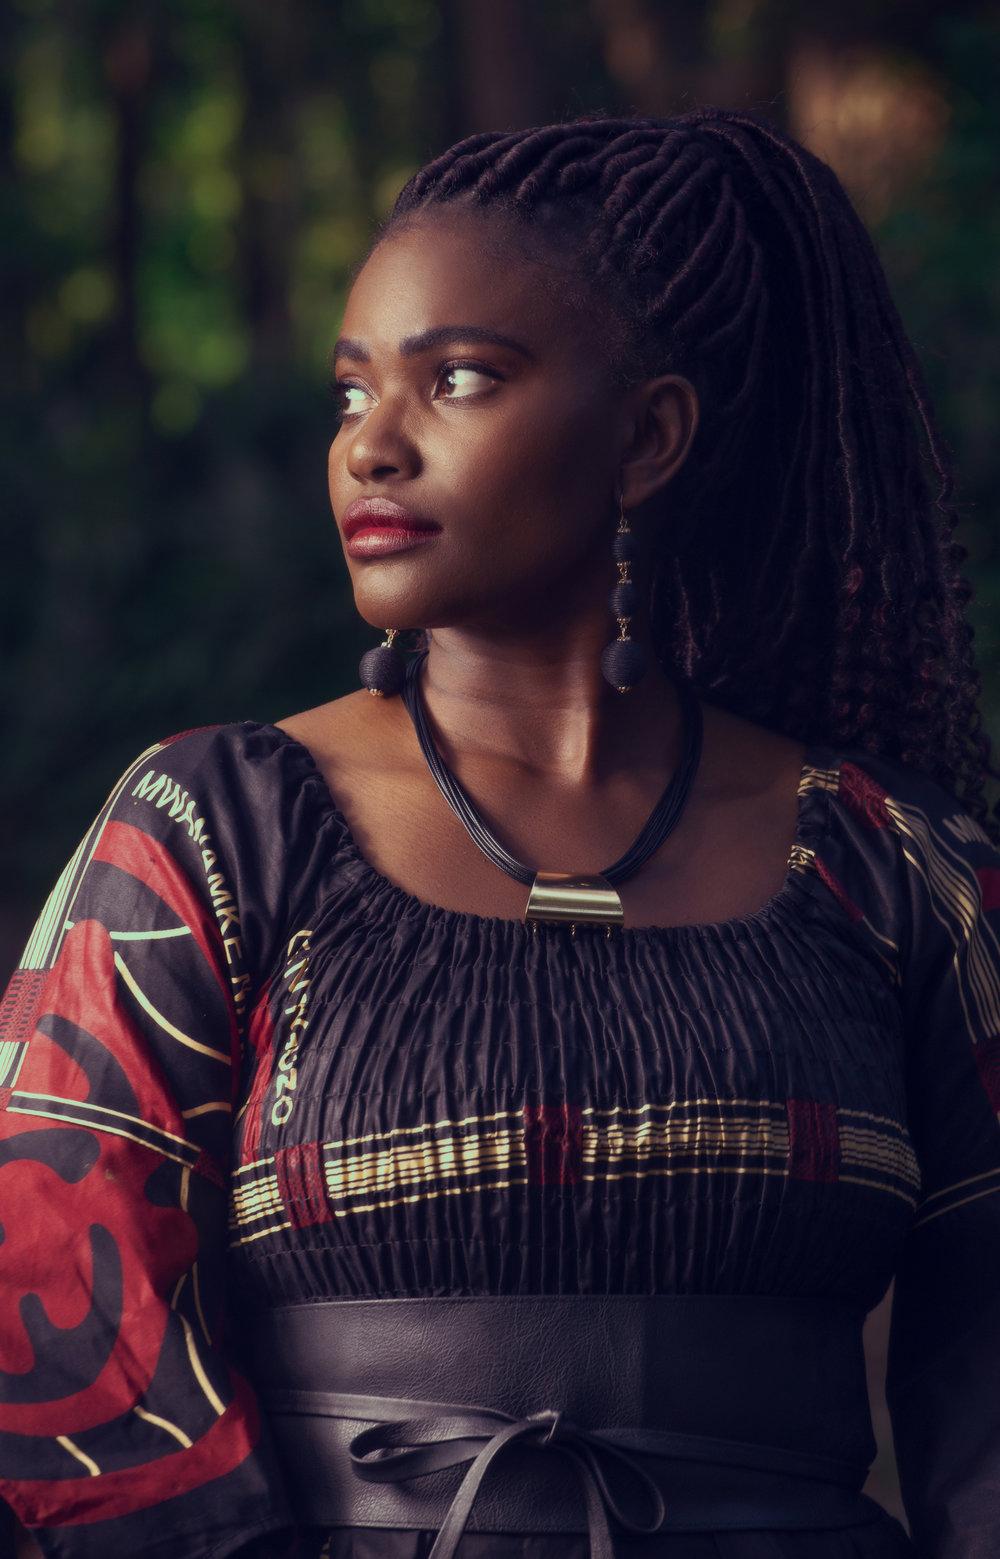 Nigerian Nightingale at Green Springs Deltona- Chamber Hart Photography by Antoine Hart